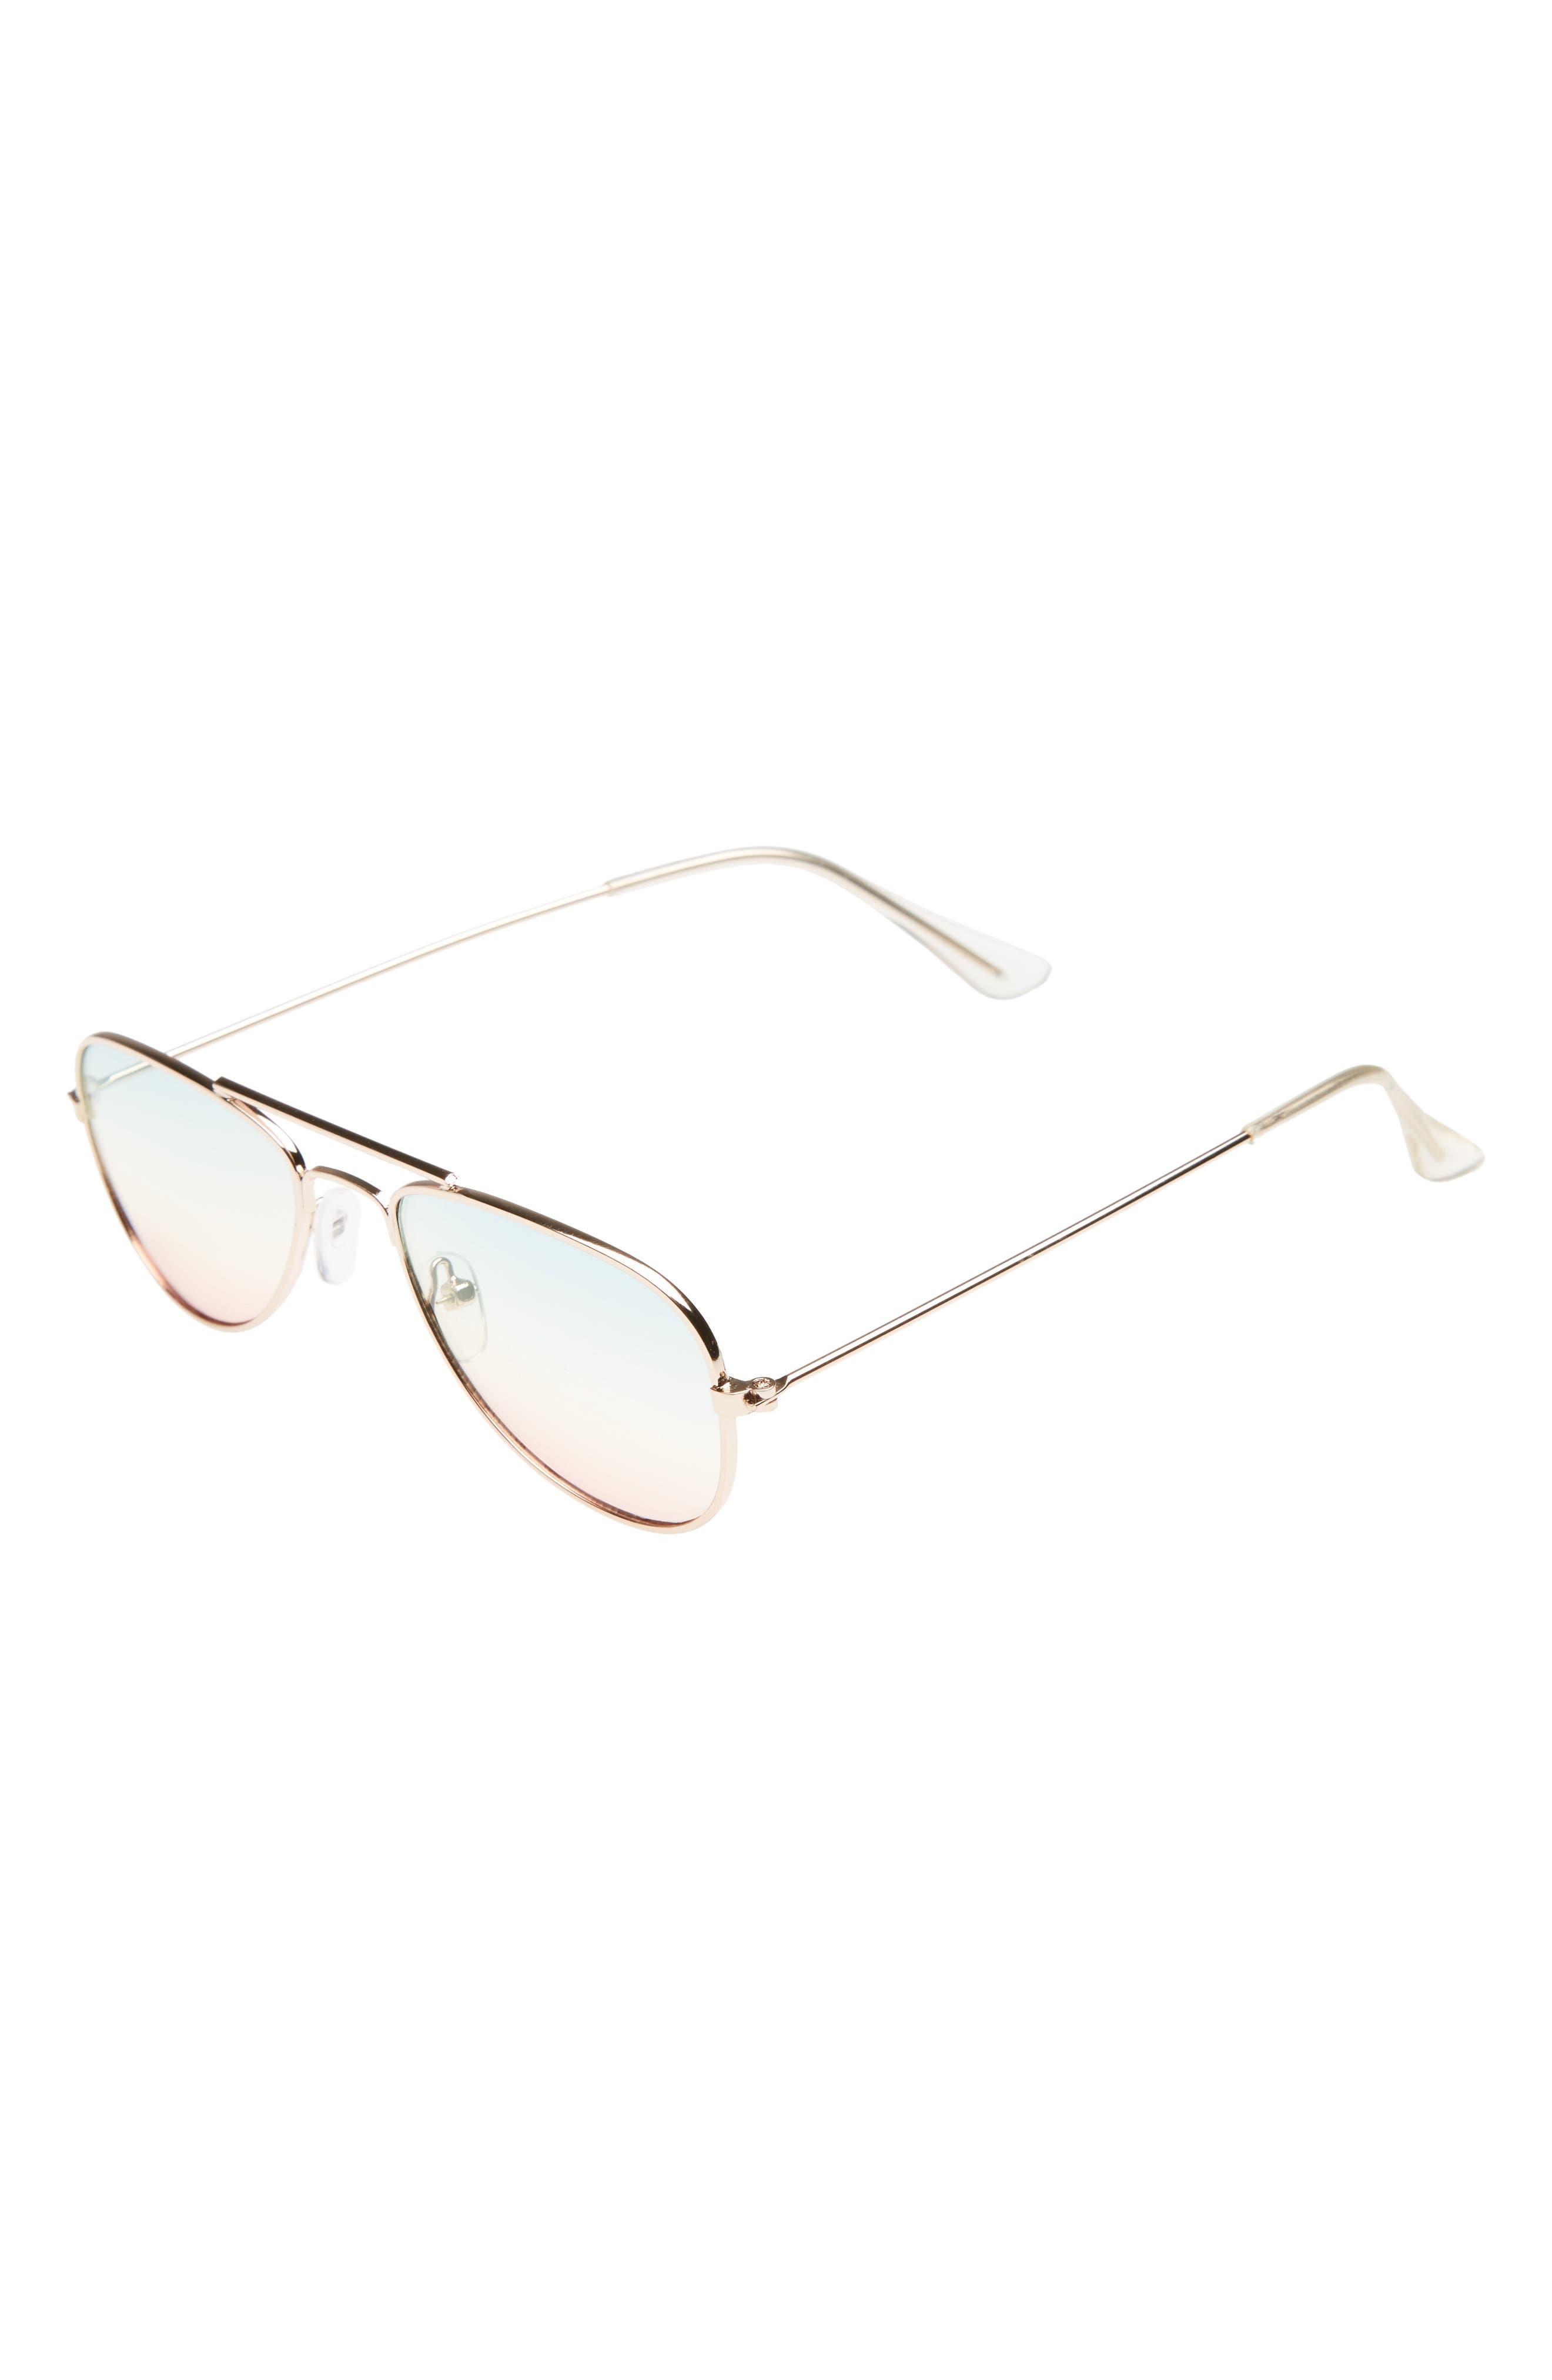 Rainbow Aviator Sunglasses,                             Main thumbnail 1, color,                             Gold